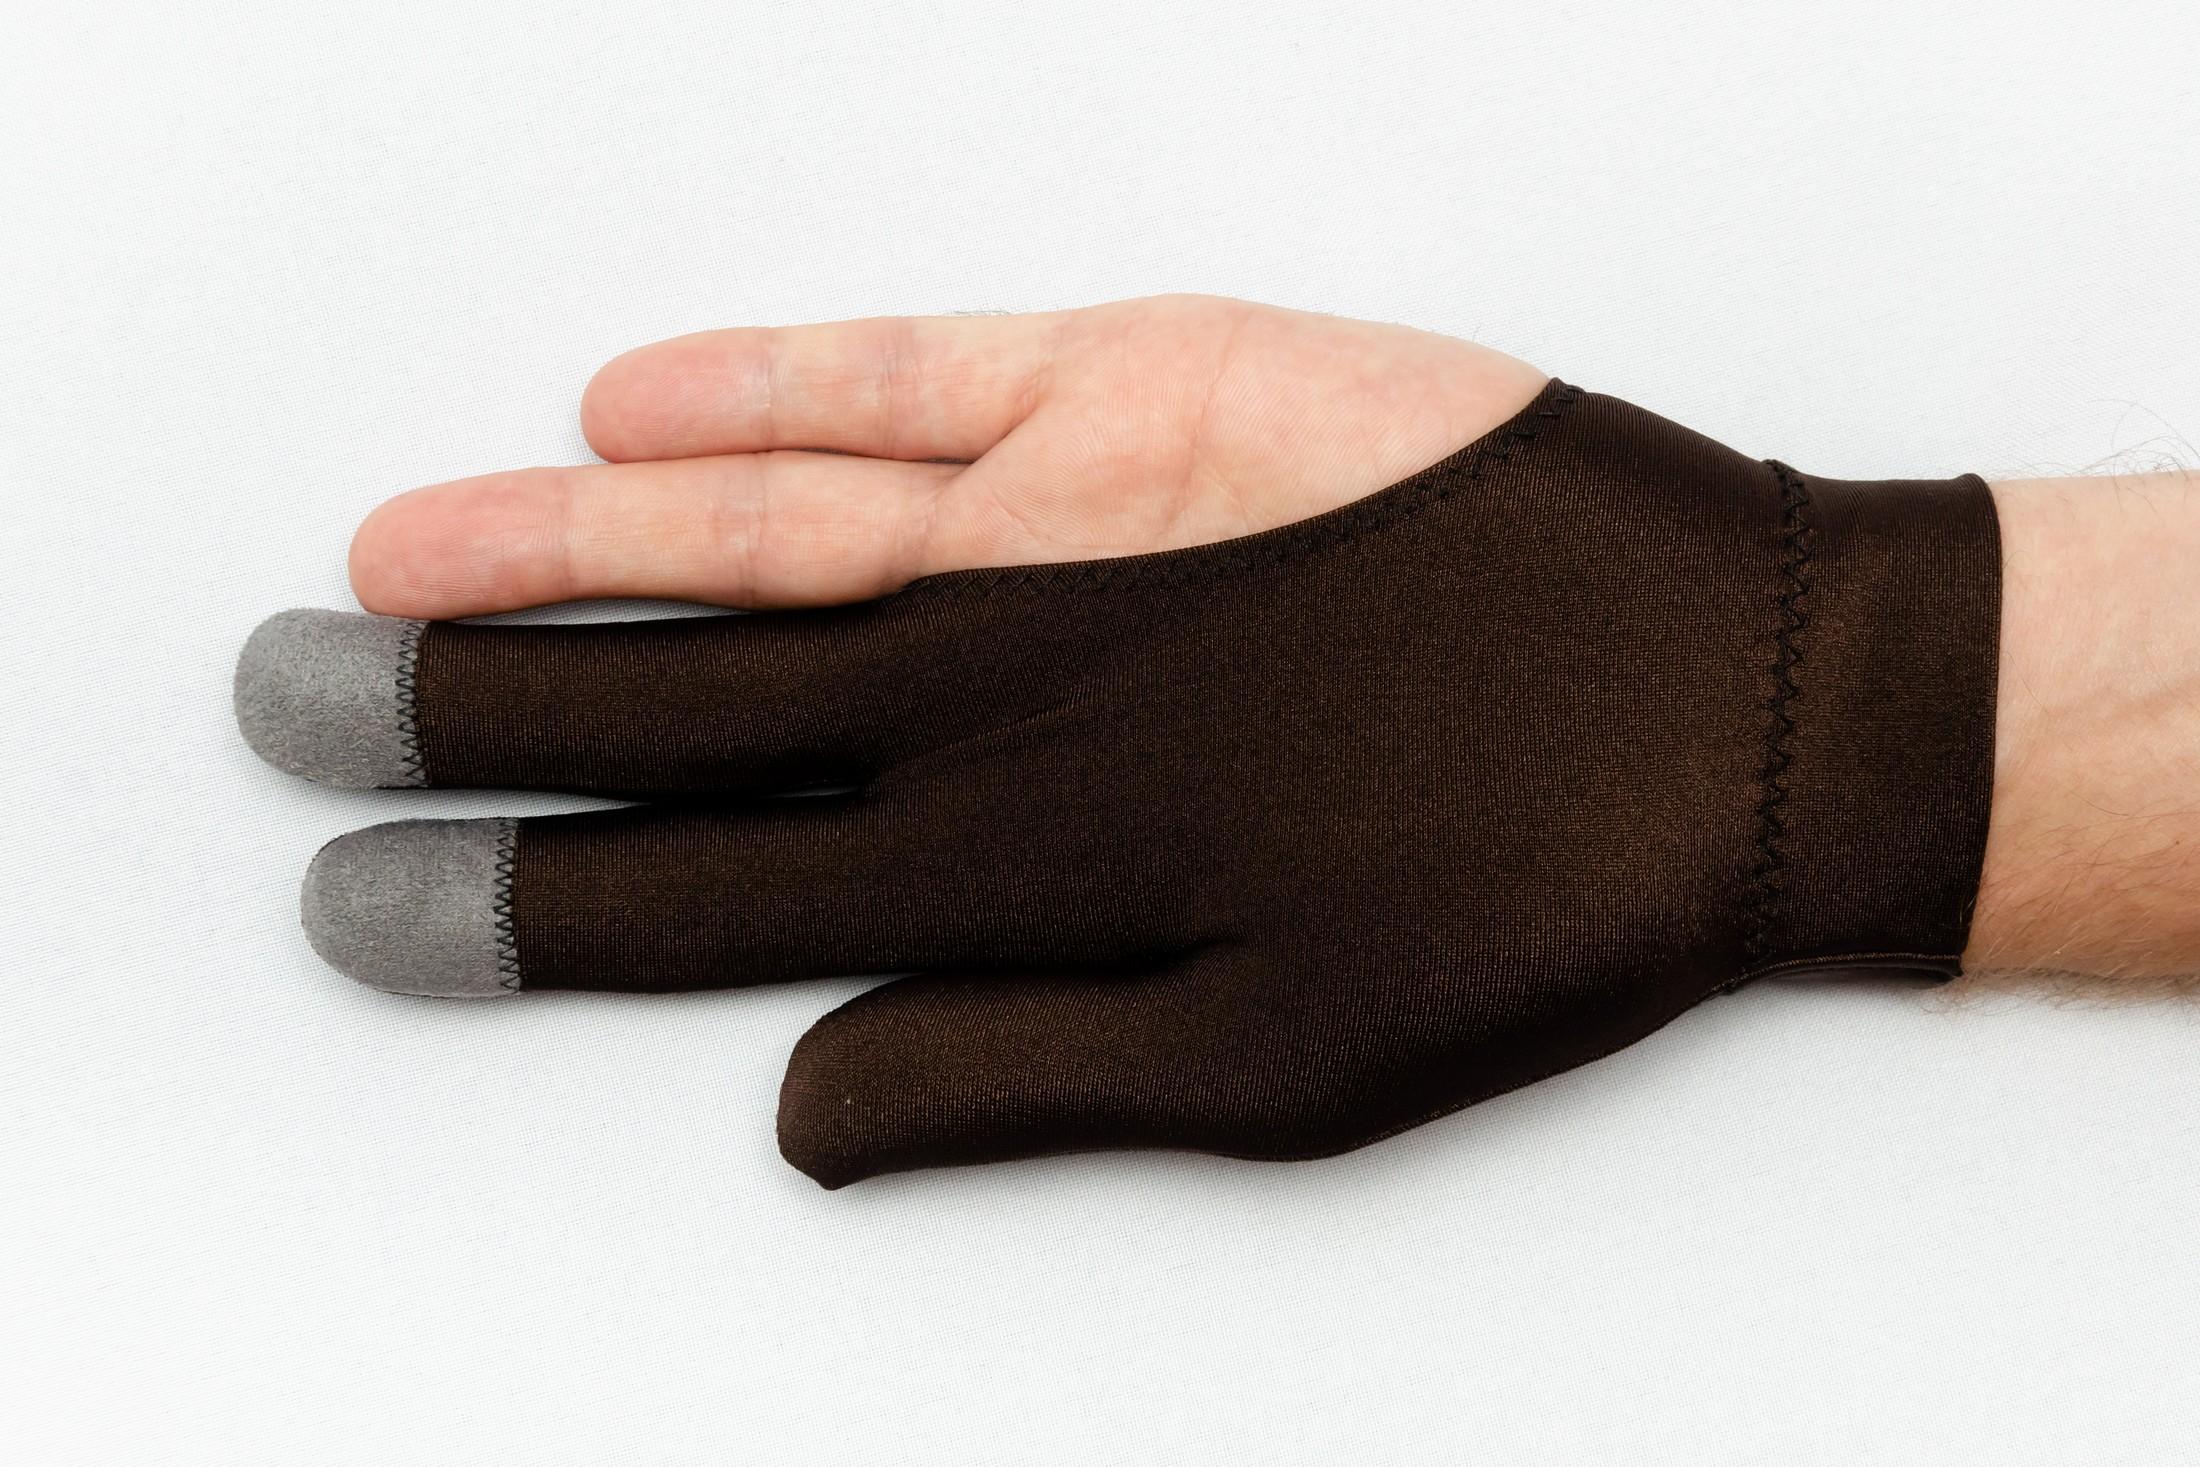 Перчатка Skiba Victory вставки на пальцах коричневая M/L